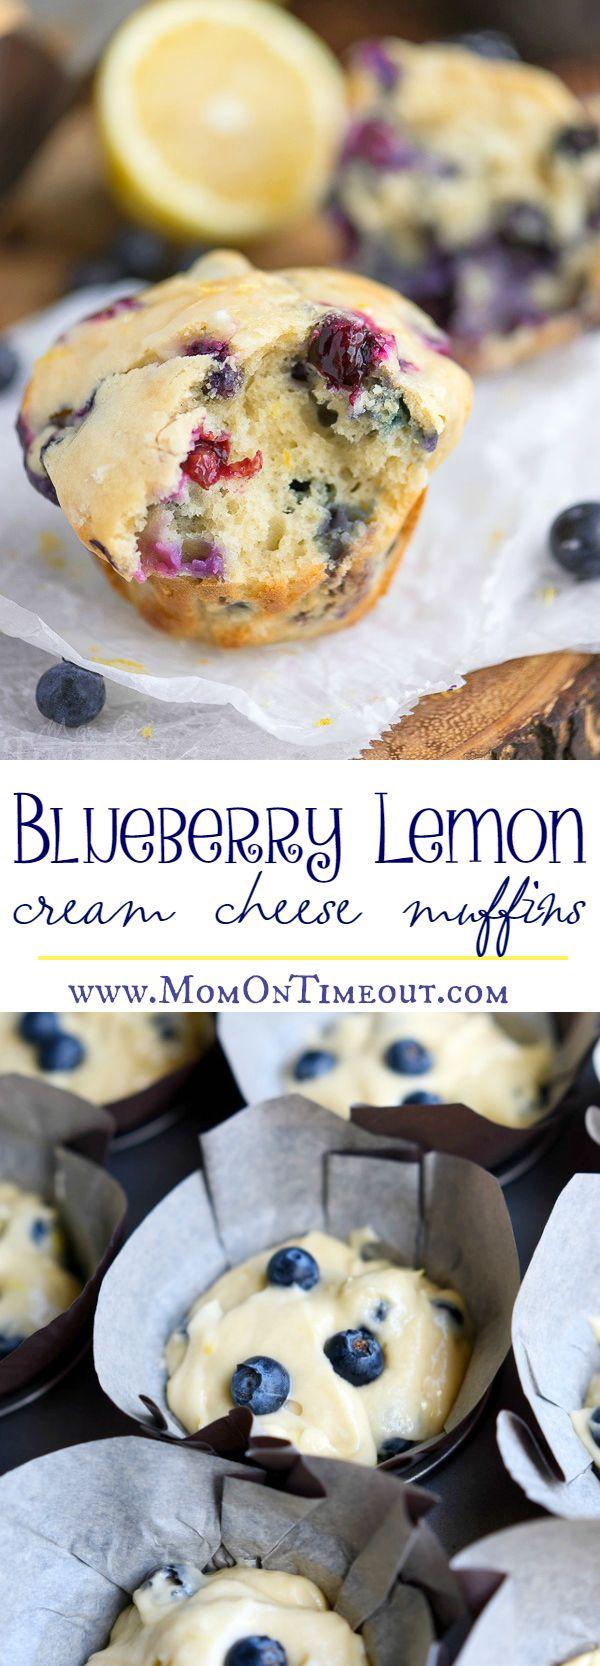 Easy Blueberry Lemon Cream Cheese Muffins  on MyRecipeMagic.com